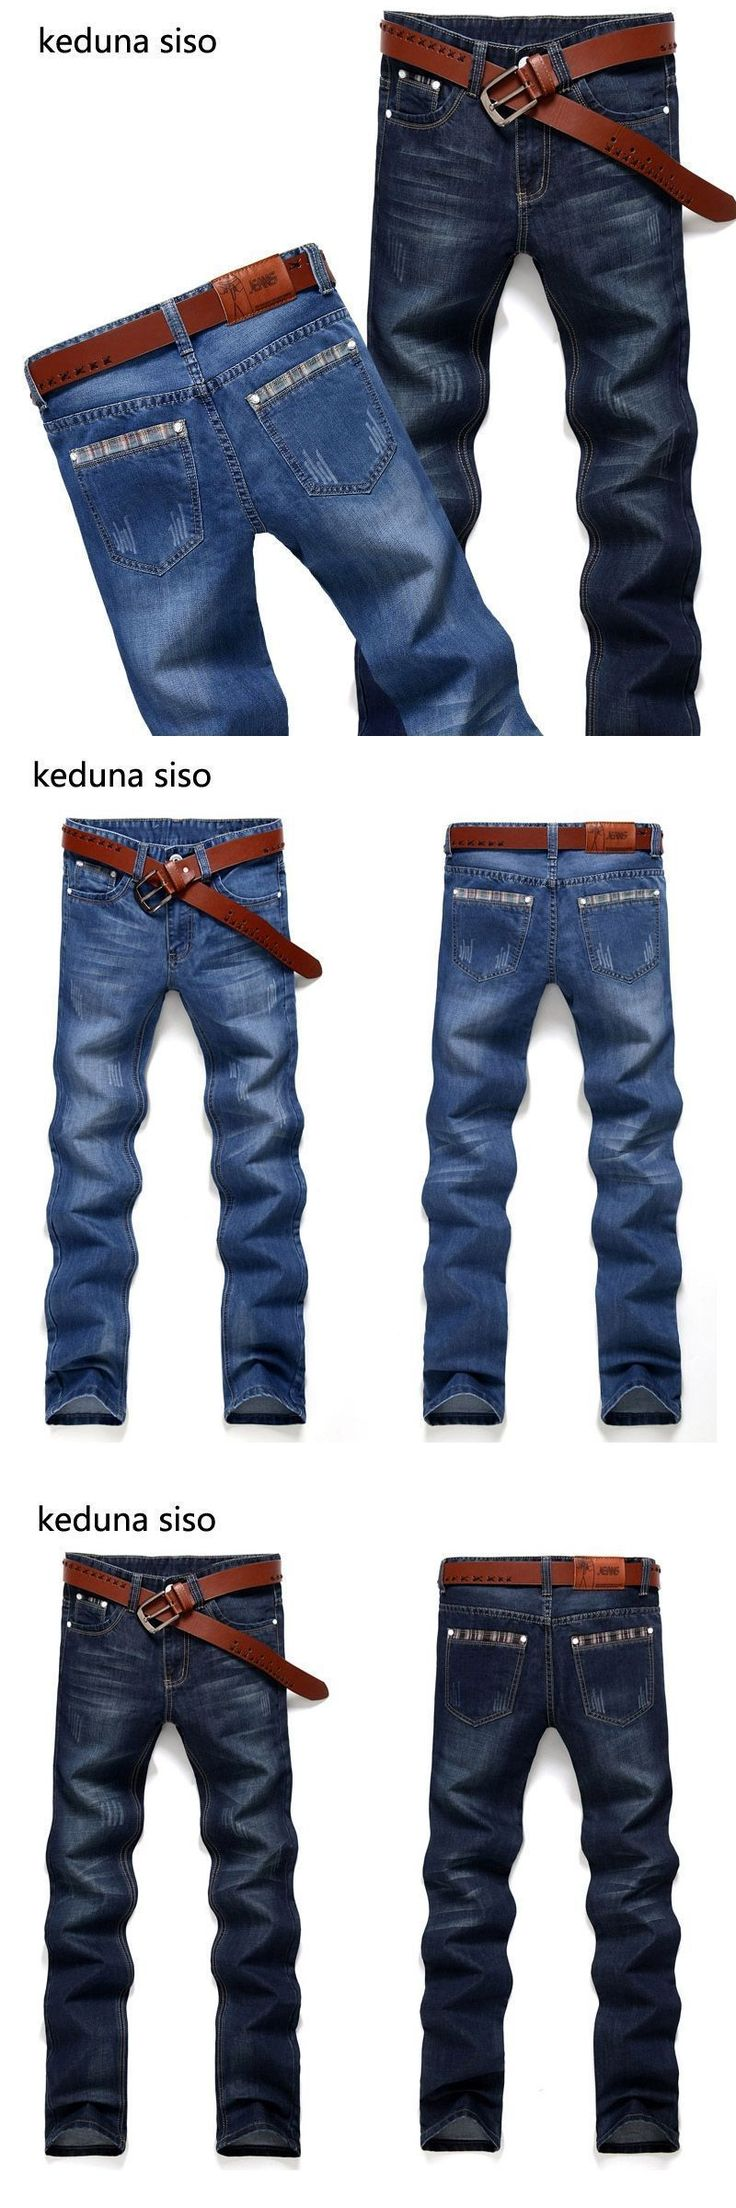 2018 New Fashion Design Straight Mens Biker Jeans Men homme Casual Blue Denim Mens Clothing Brand Jeans Men hombre #mensjeansbrands #mensjeansfashion #mensjeansstraight